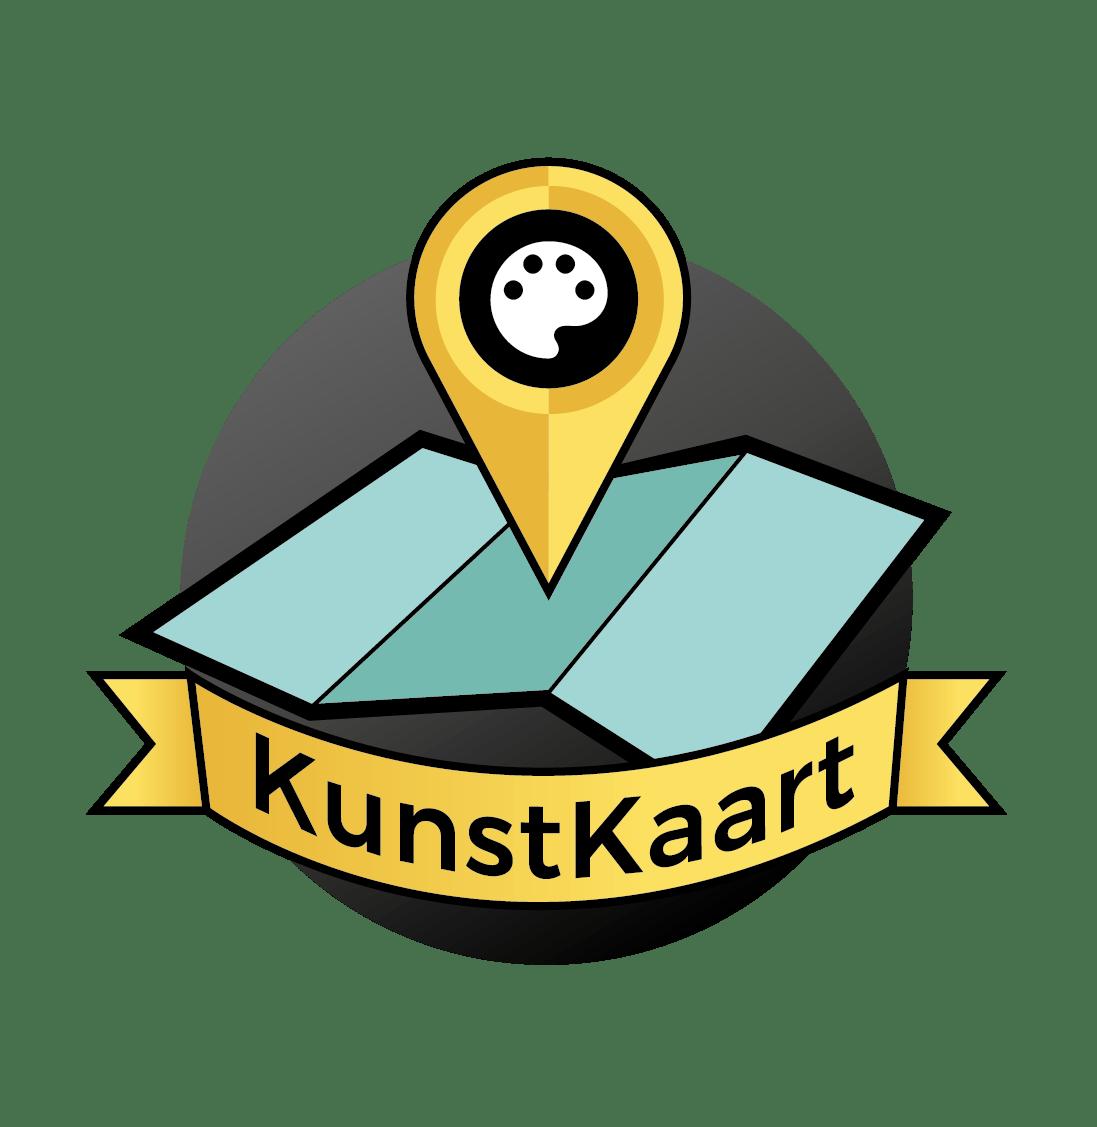 KunstKaart Amsterdam